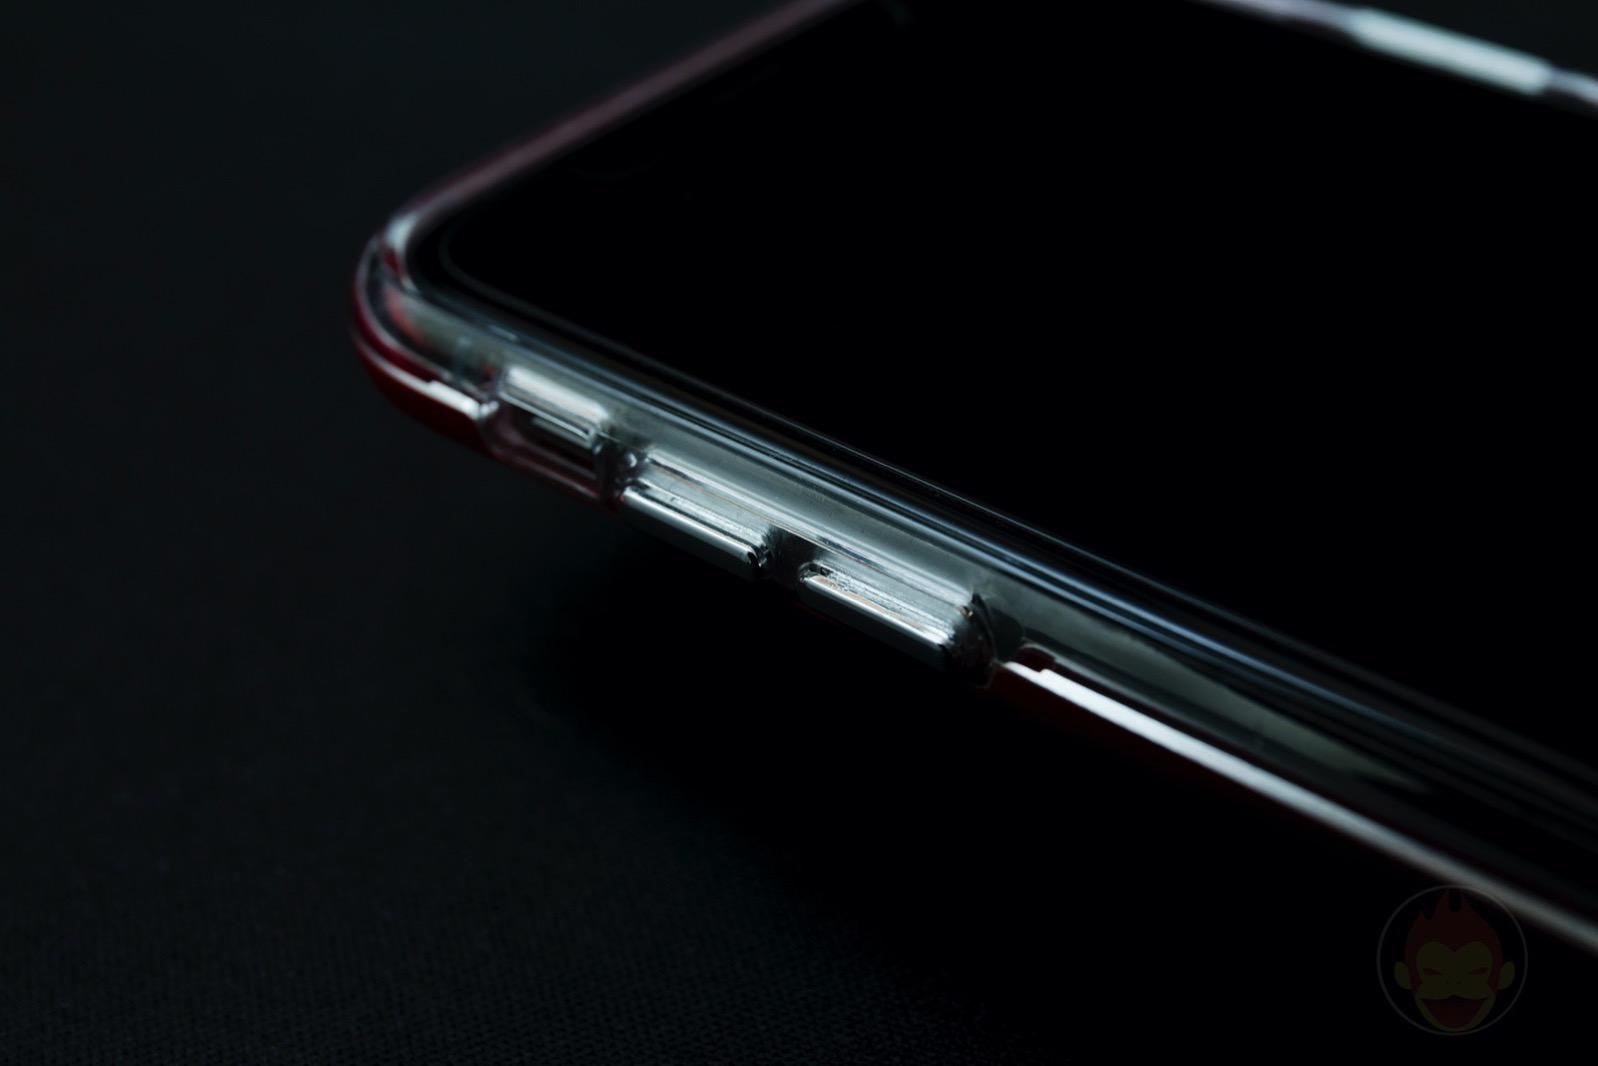 PhoneFoam-Dual-Skin-iPhoneX-Case-06.jpg